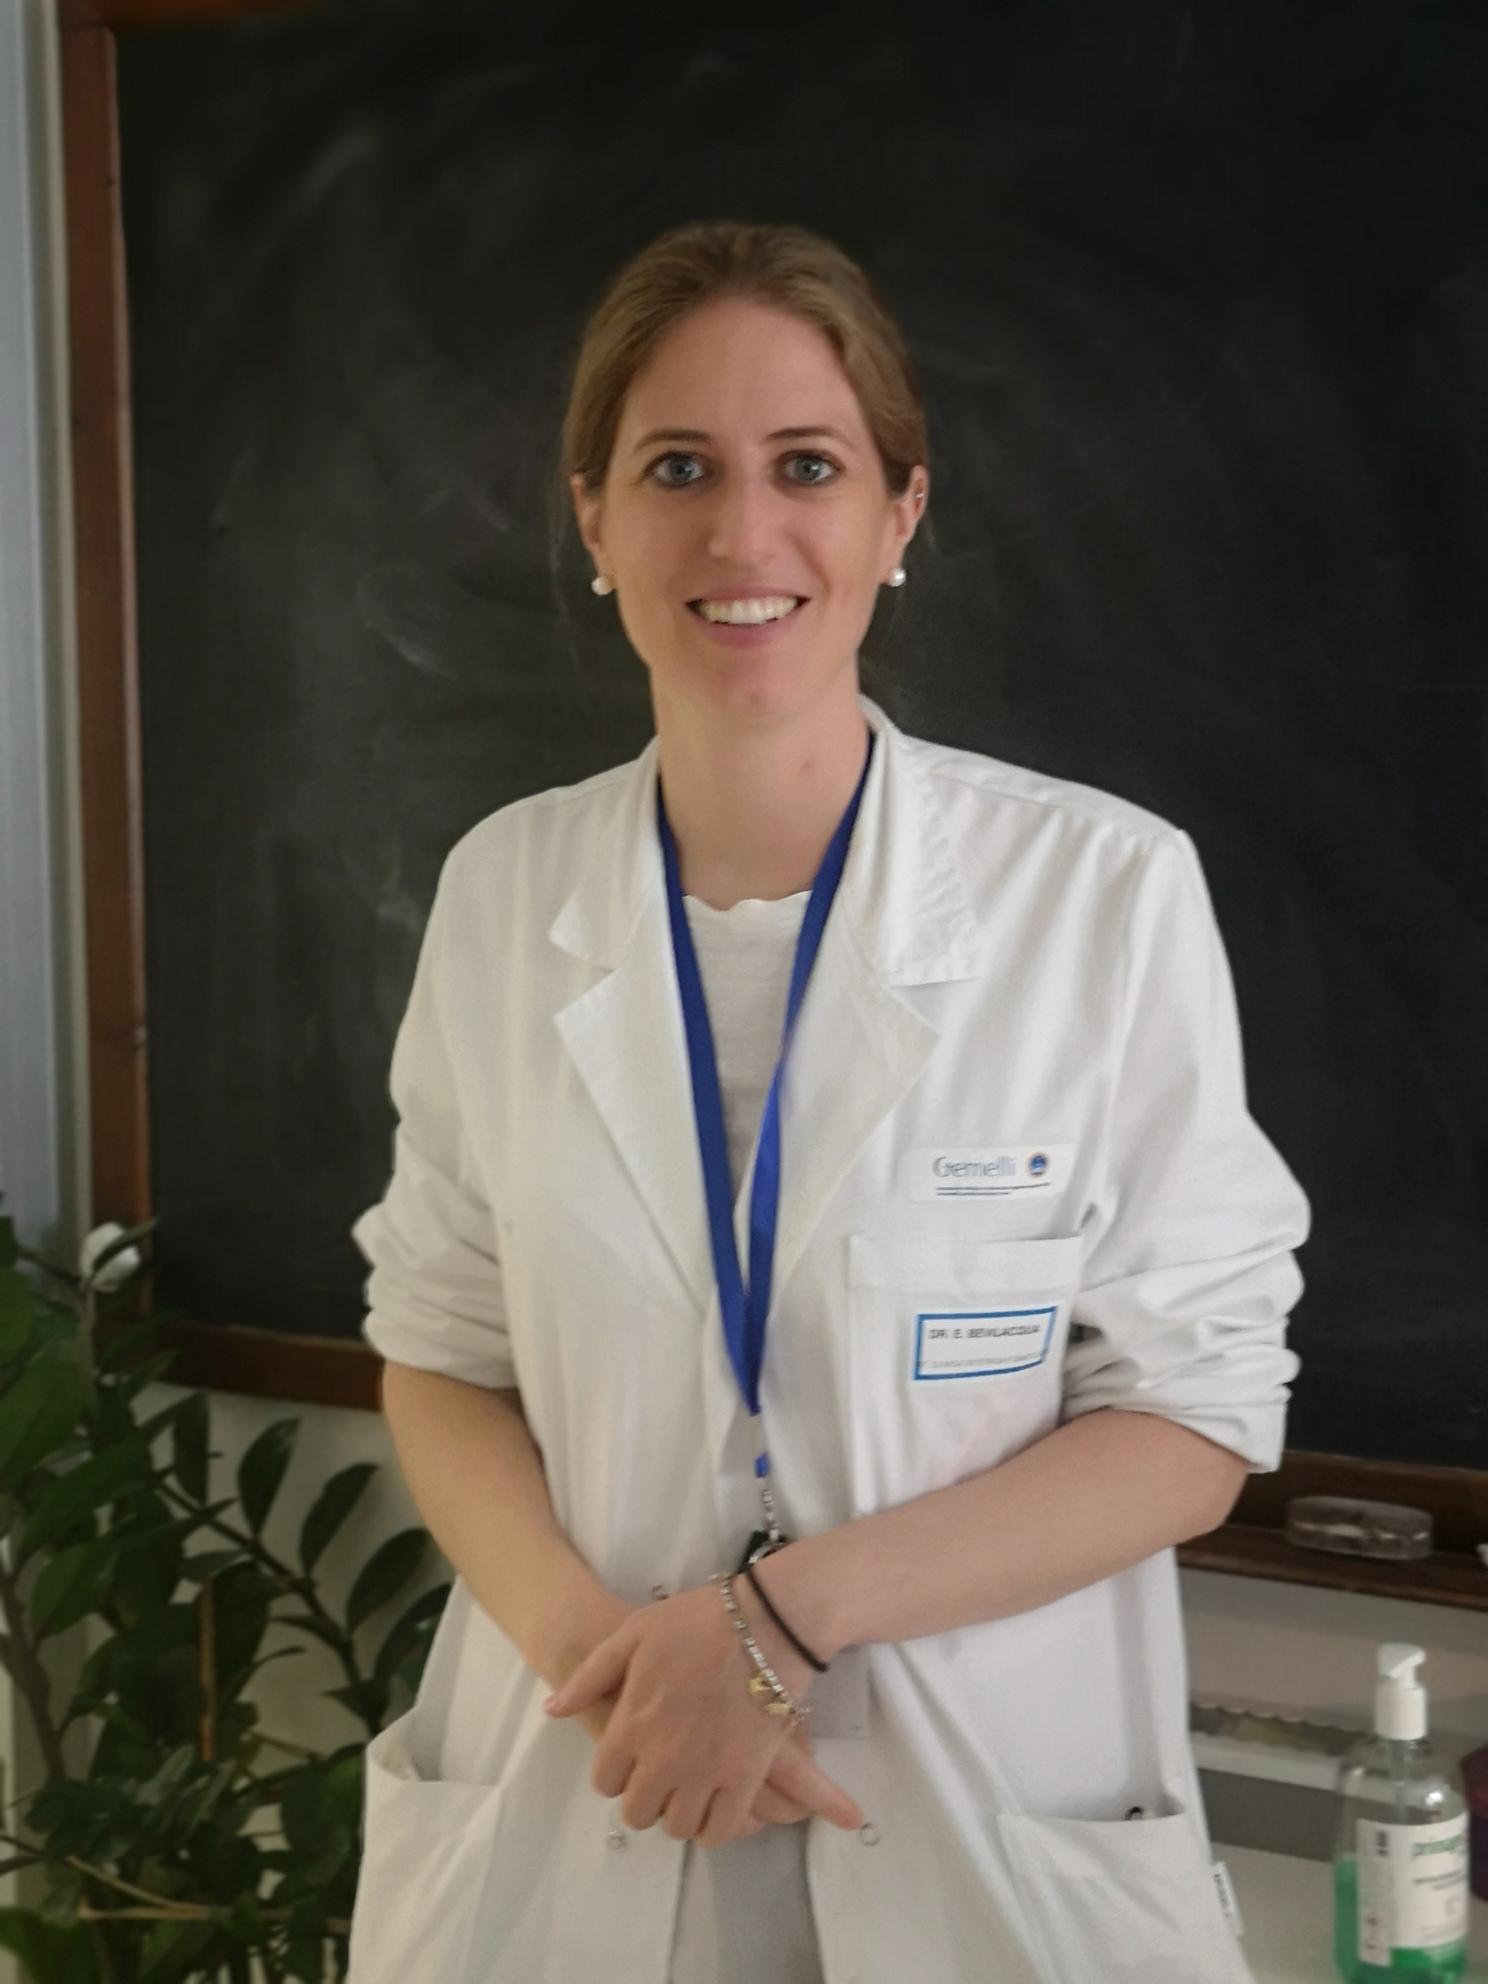 Dott.ssa ELISA BEVILACQUA